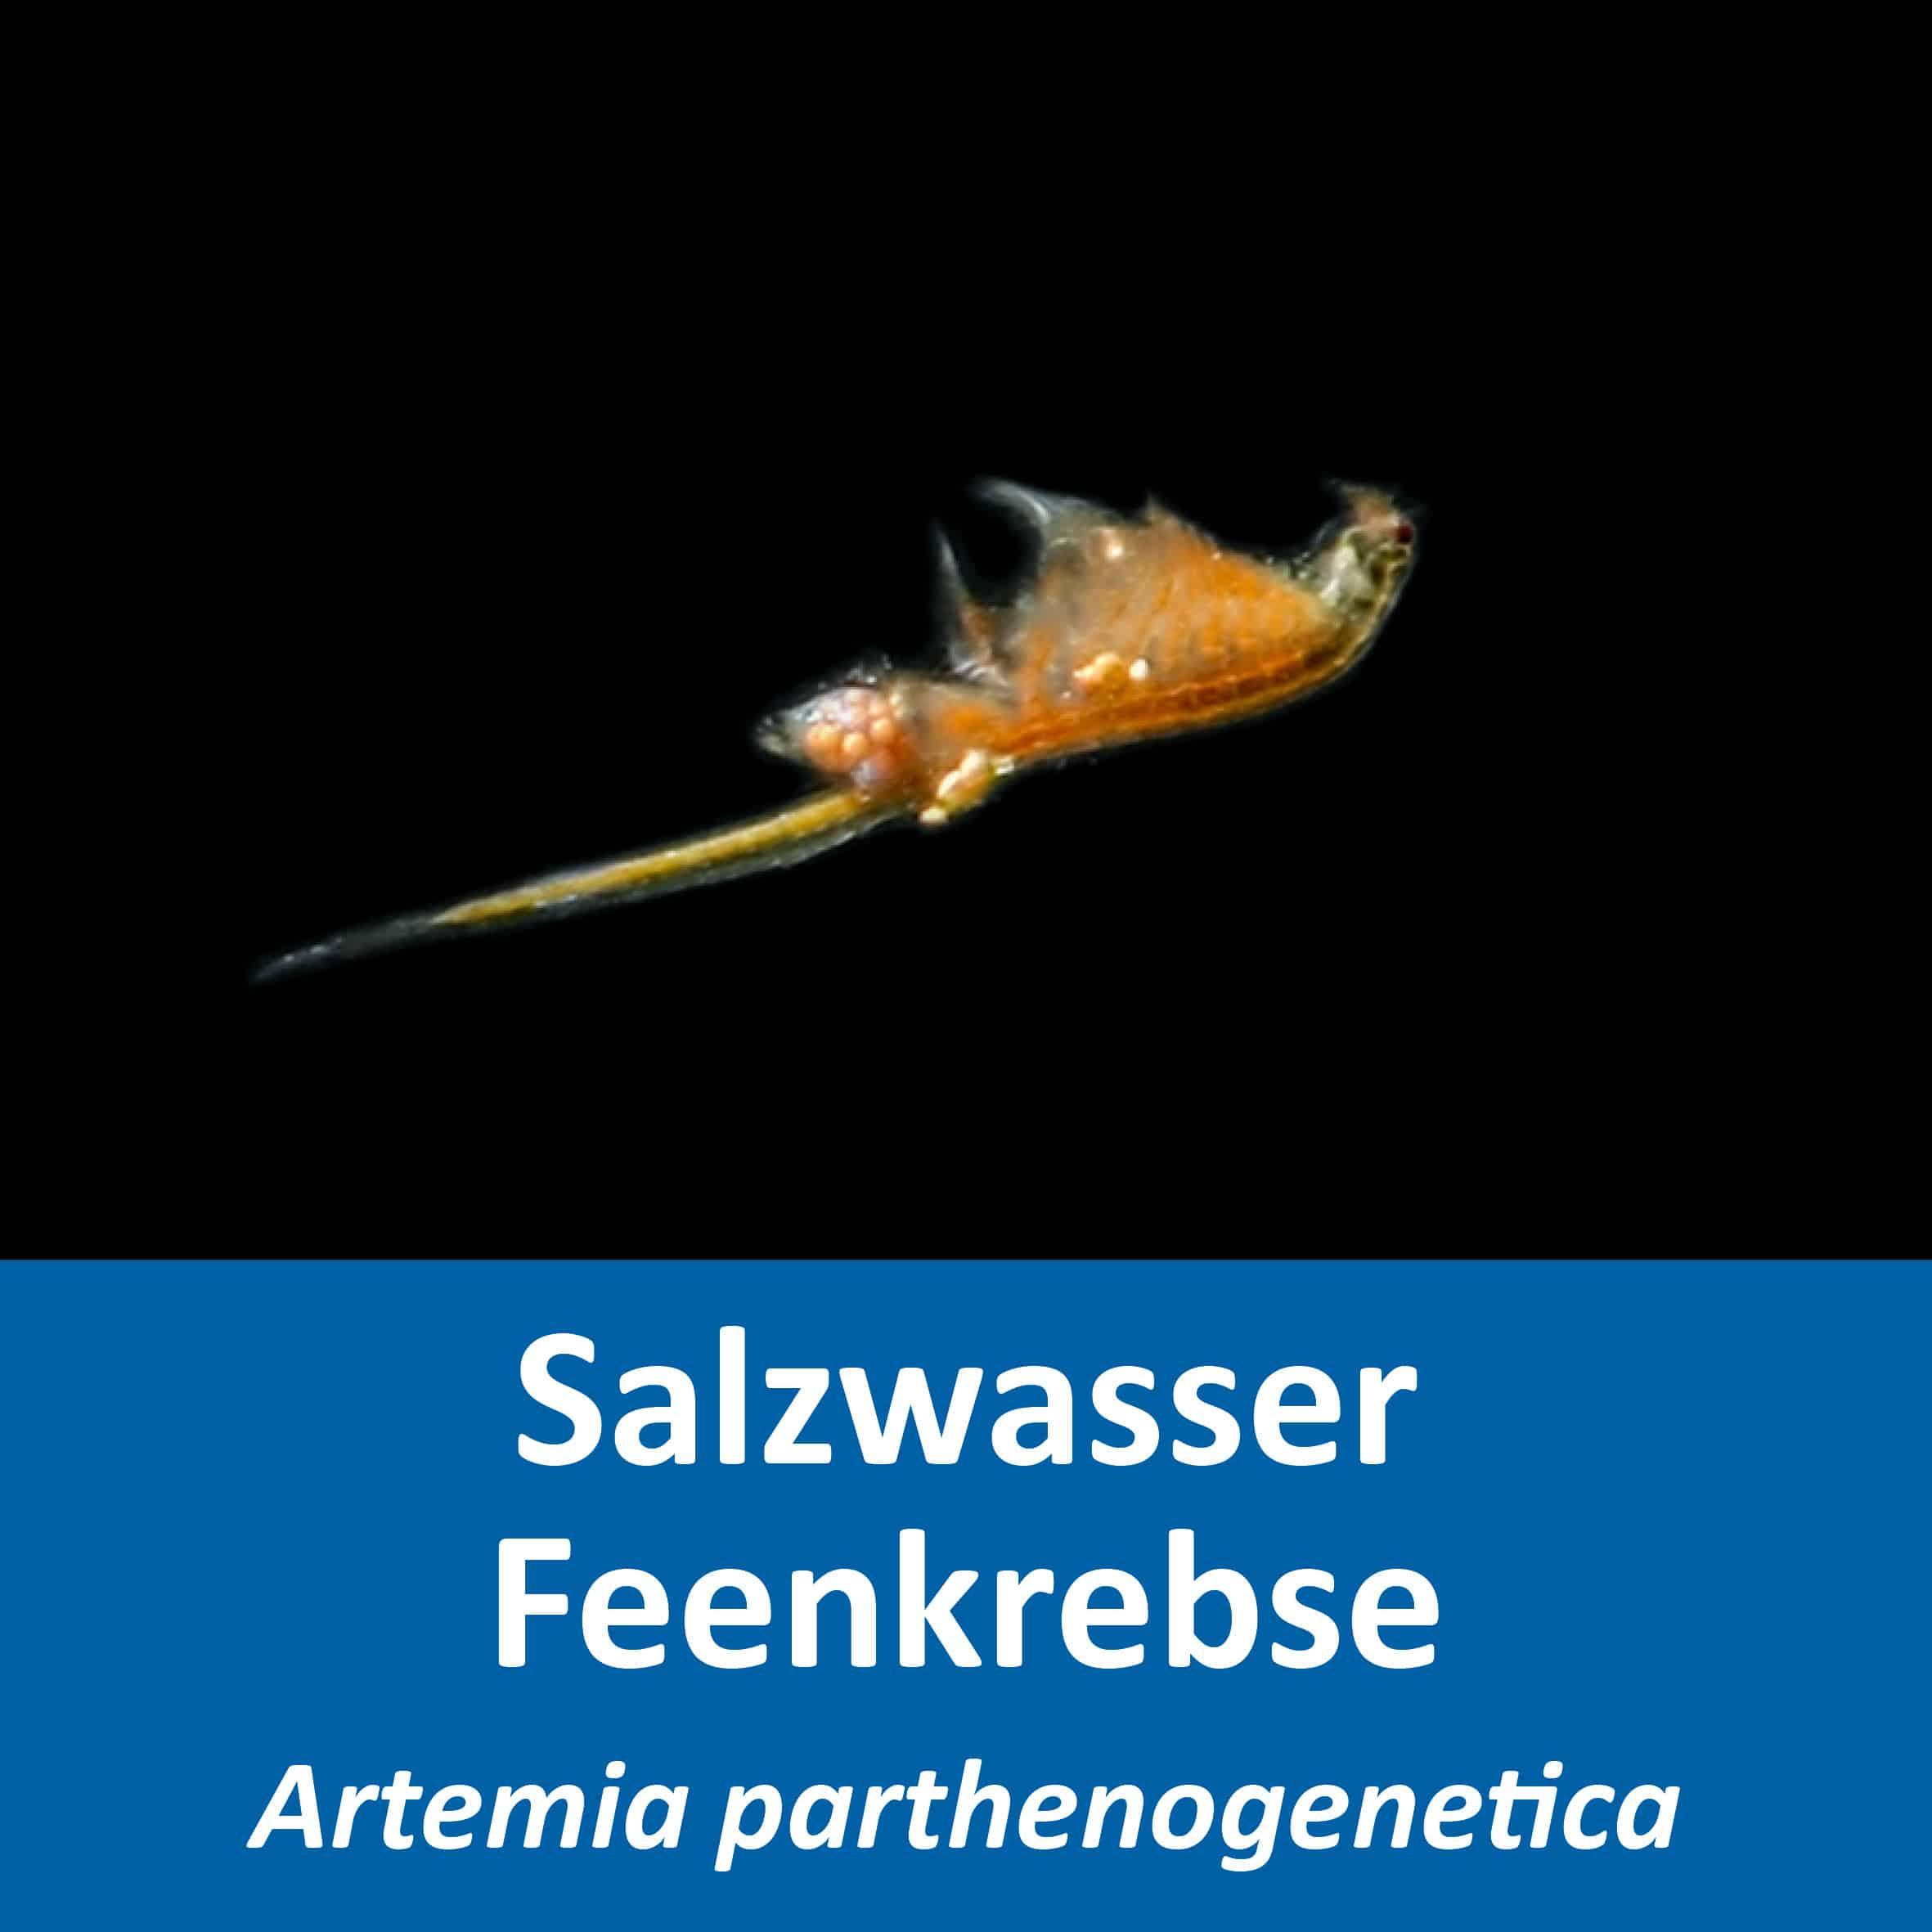 Artemia parthenogenetica